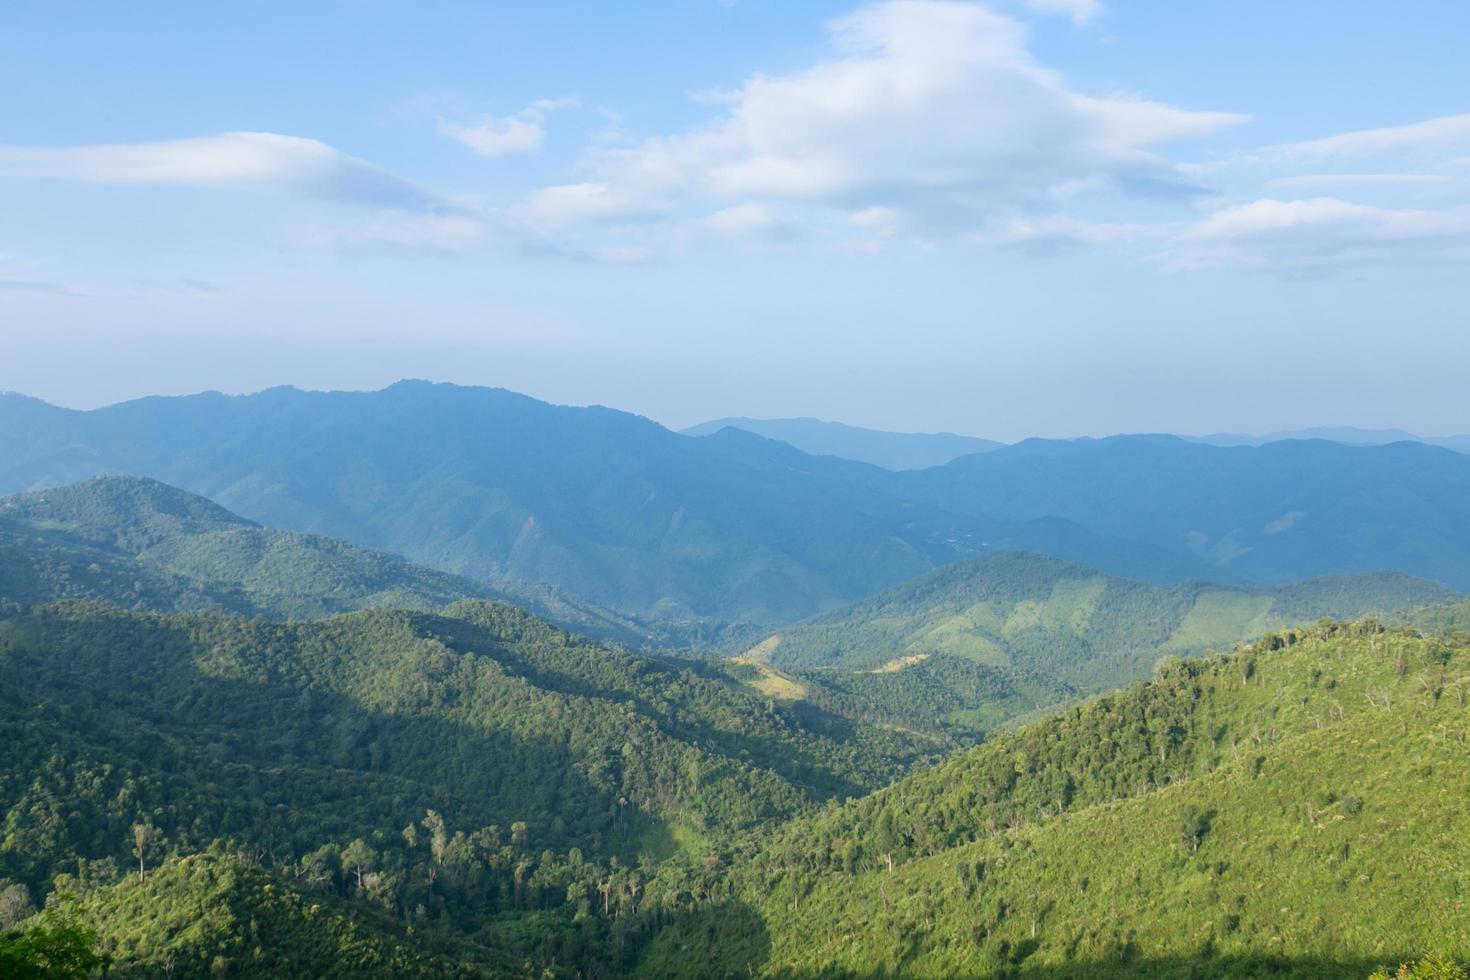 cielo, foresta e montagne foto